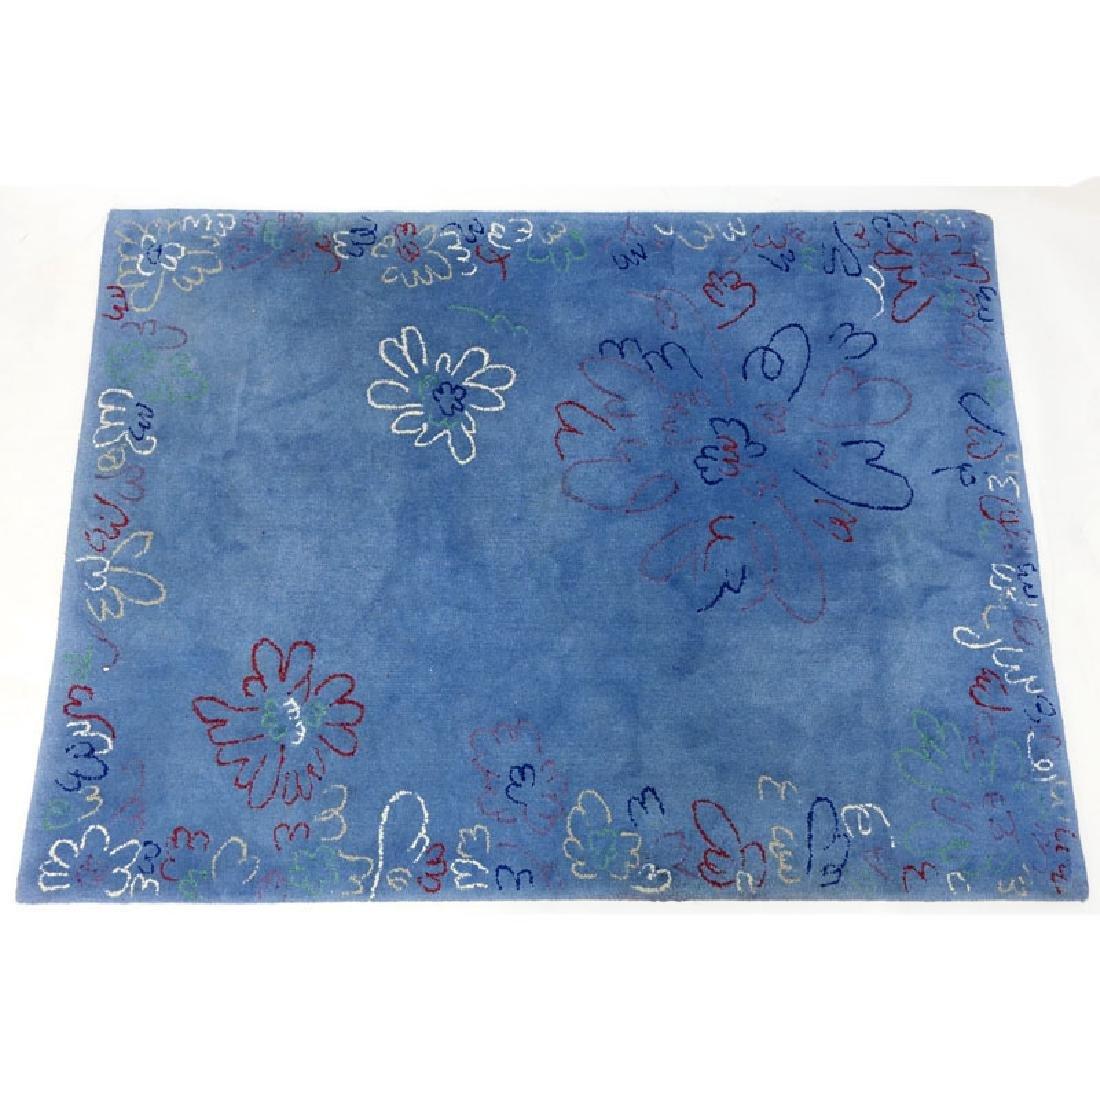 Edward Fields Colorful Floral Wool Rug. Signed en verso